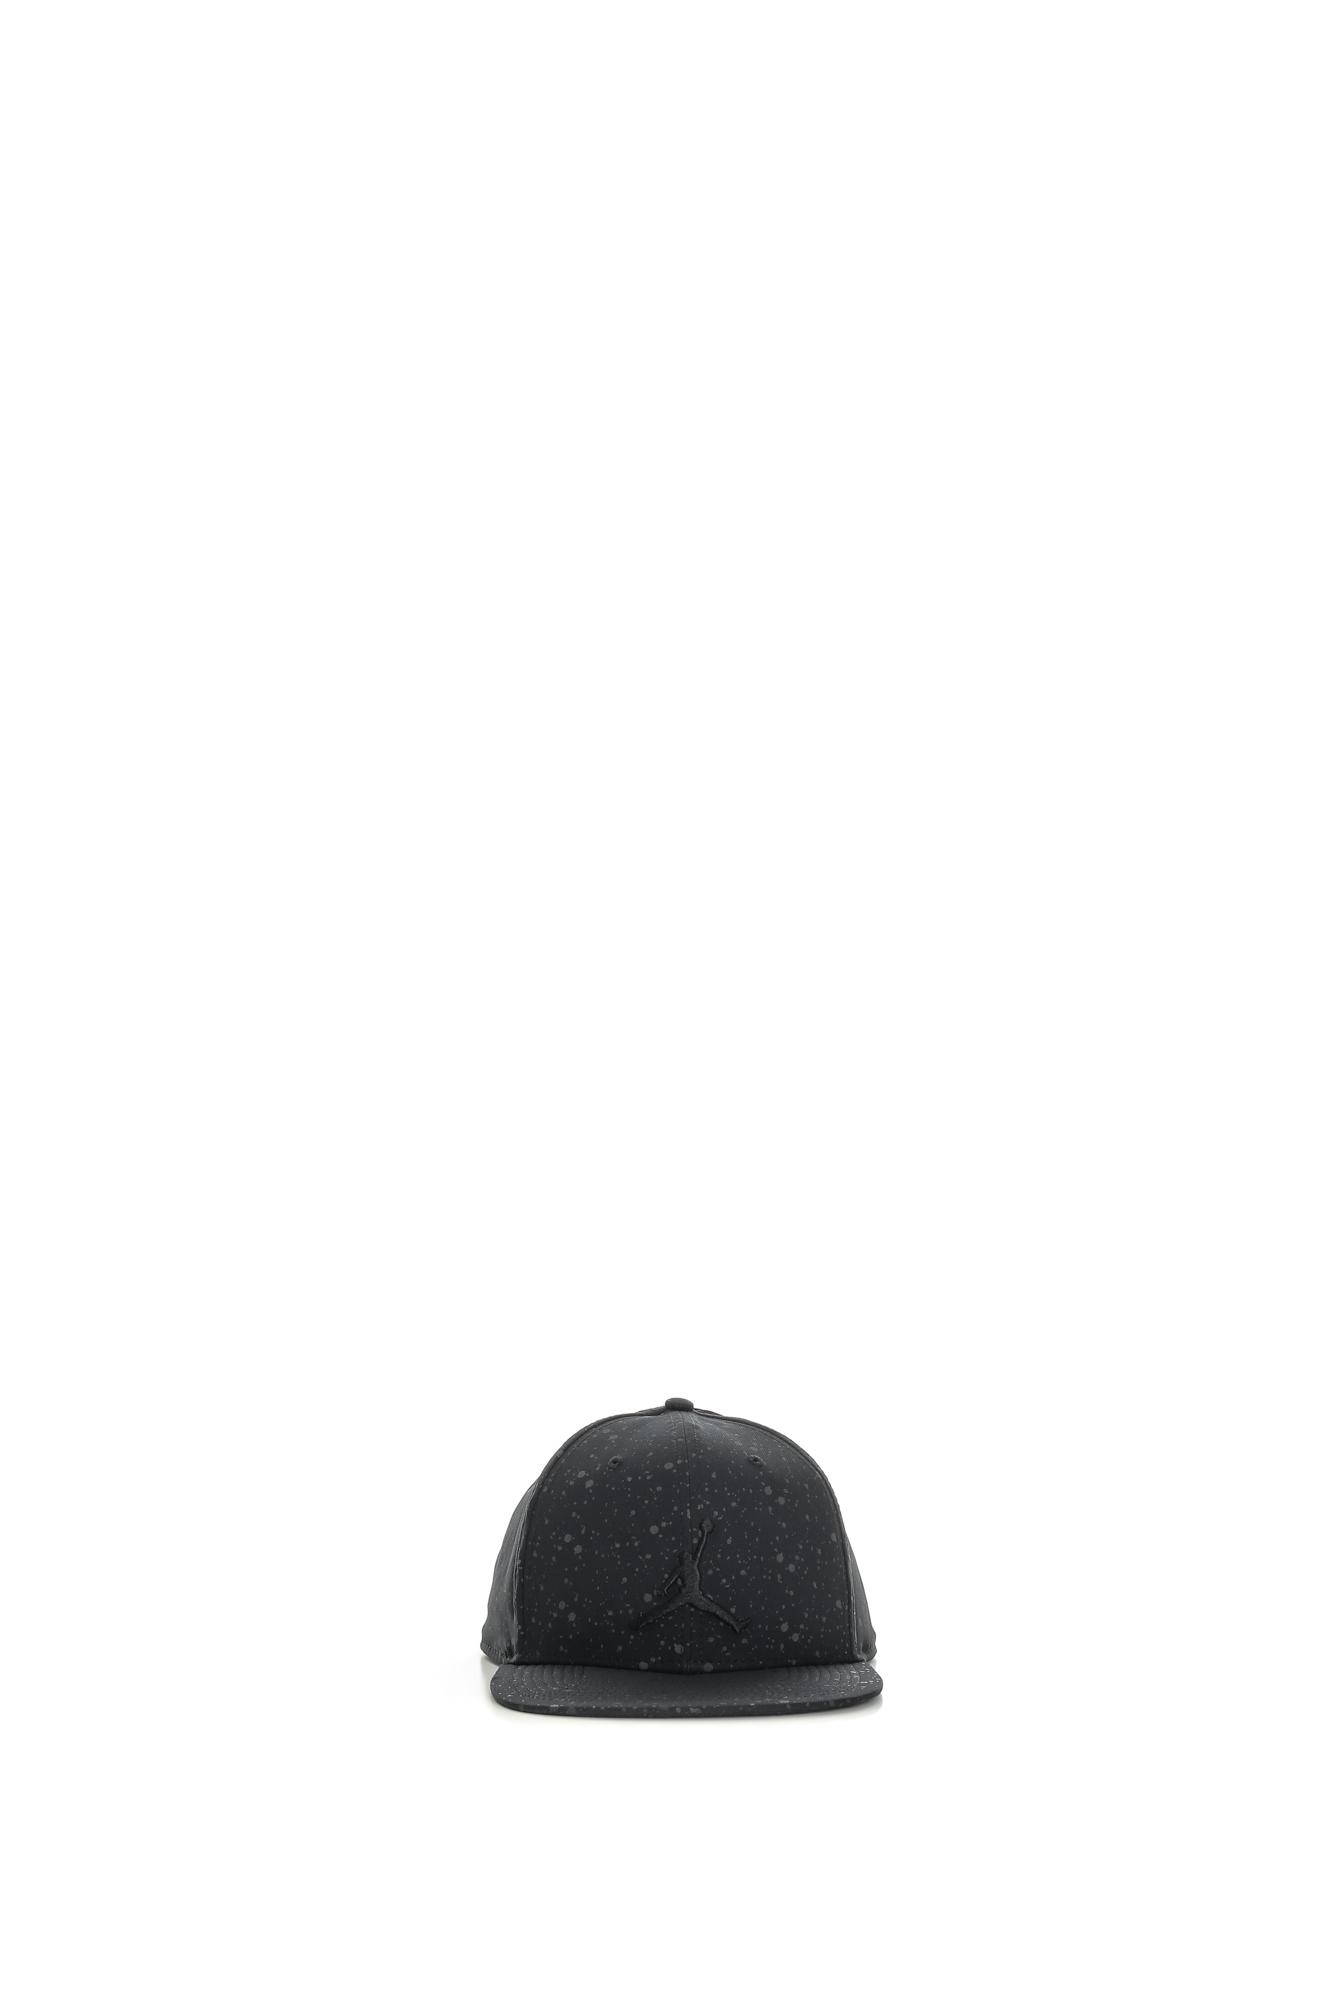 NIKE - Unisex καπέλο Nike JORDAN SPECKLE PRINT SNAPBACK μαύρο γυναικεία αξεσουάρ καπέλα αθλητικά